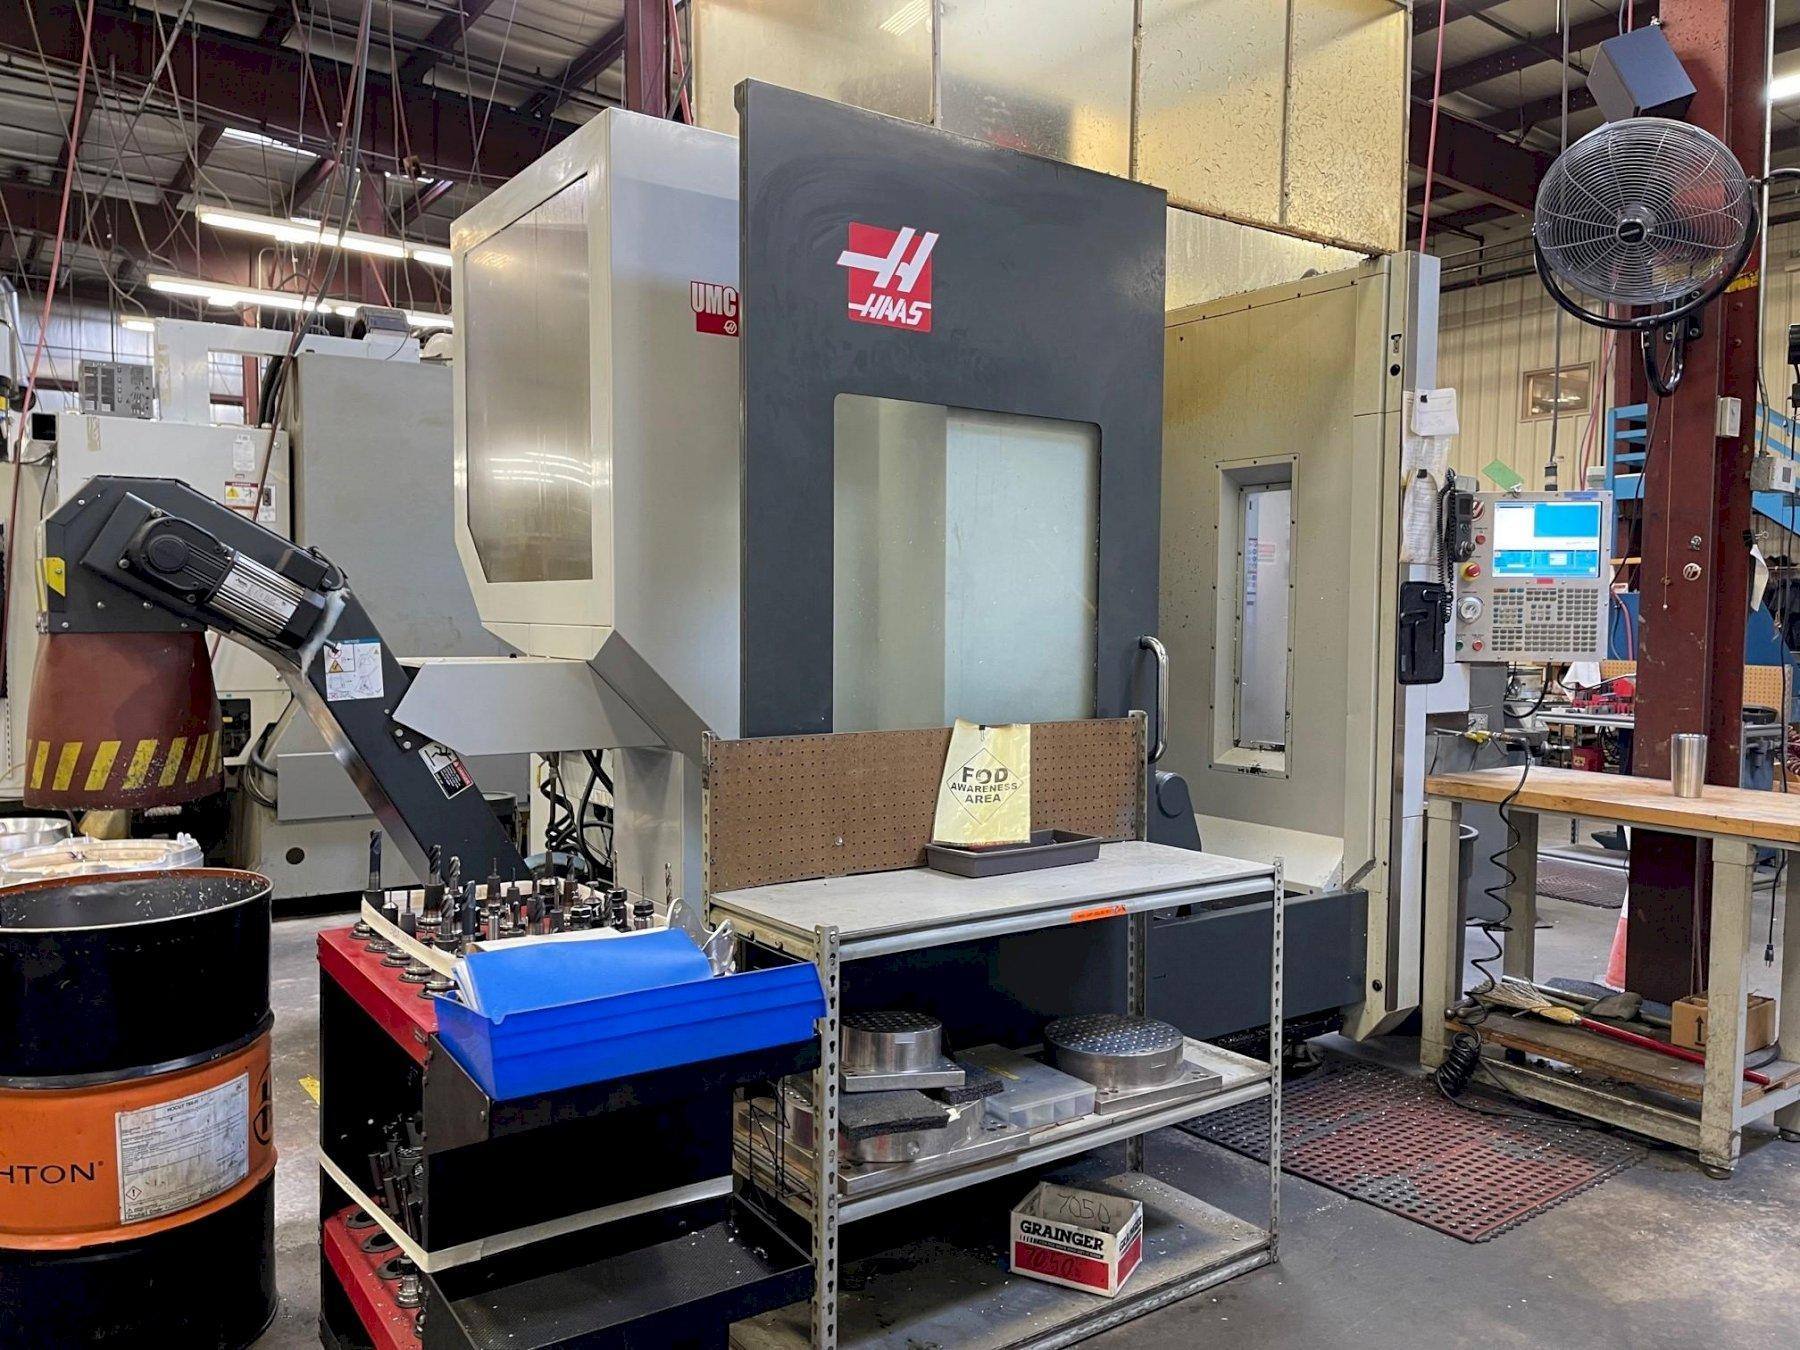 Haas UMC750 5 Axis Vertical Machining Center